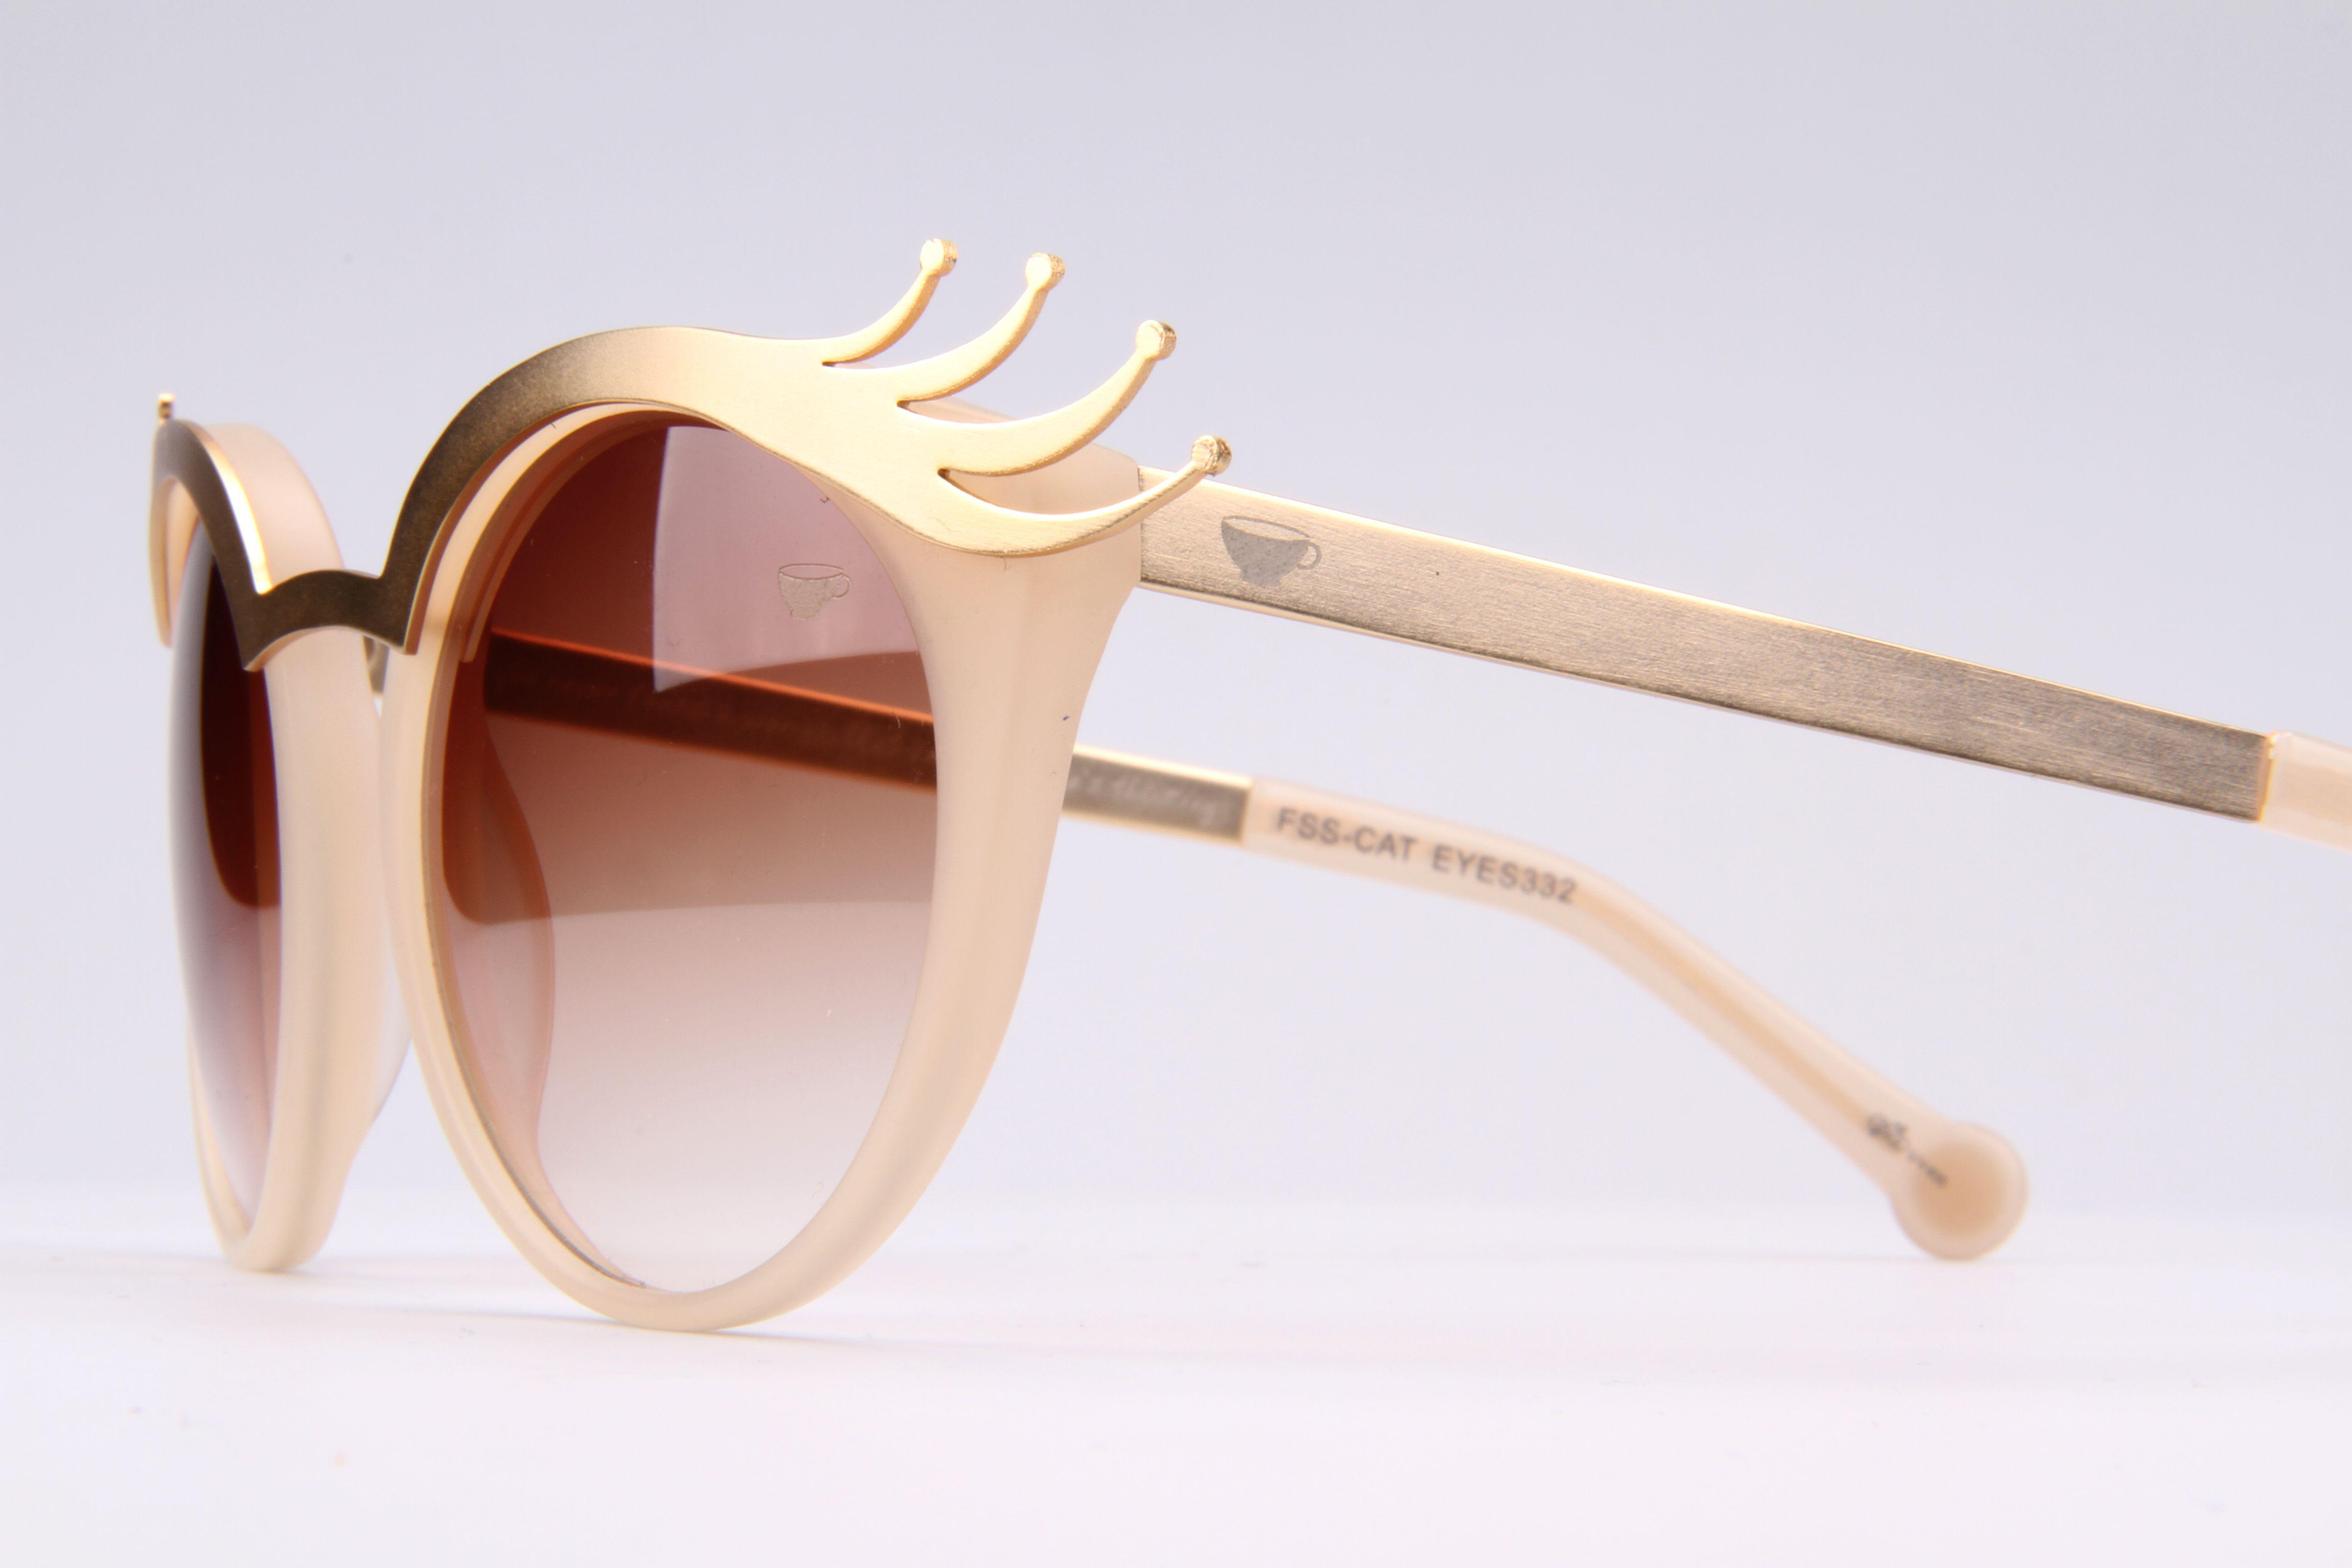 b5c94eb40 Óculos Cílios - Chilli Beans | Oculos CHILLIBEANS <3 | Eyeglasses ...